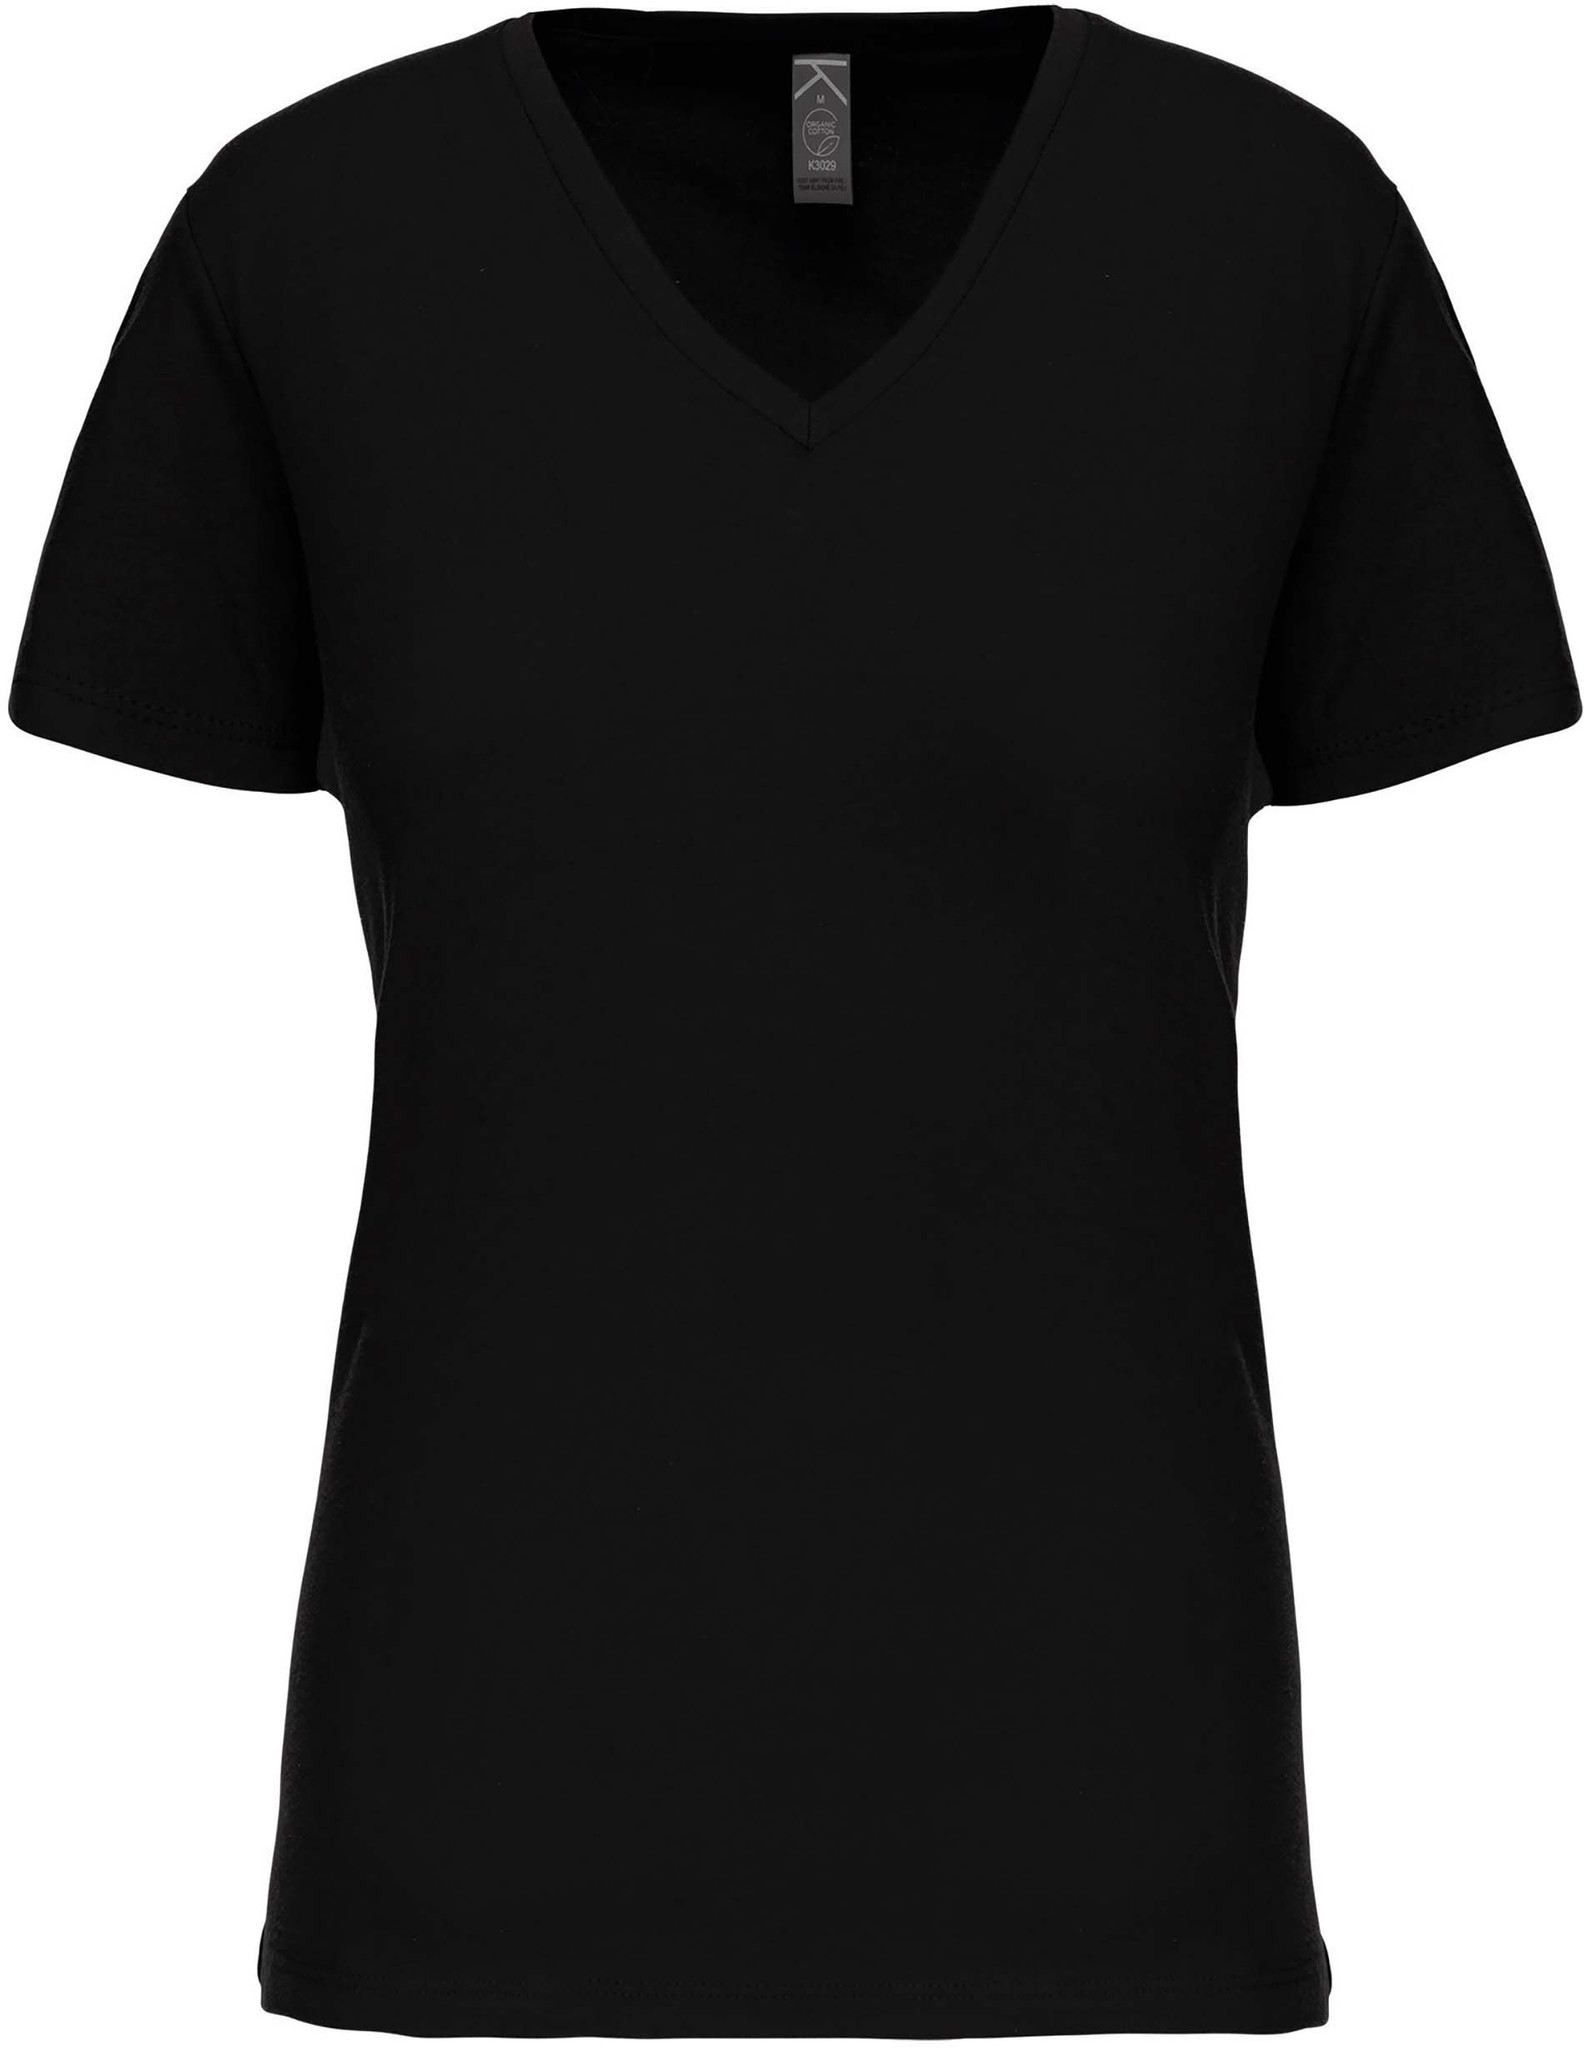 Eco-Friendly Dames T-shirt Black